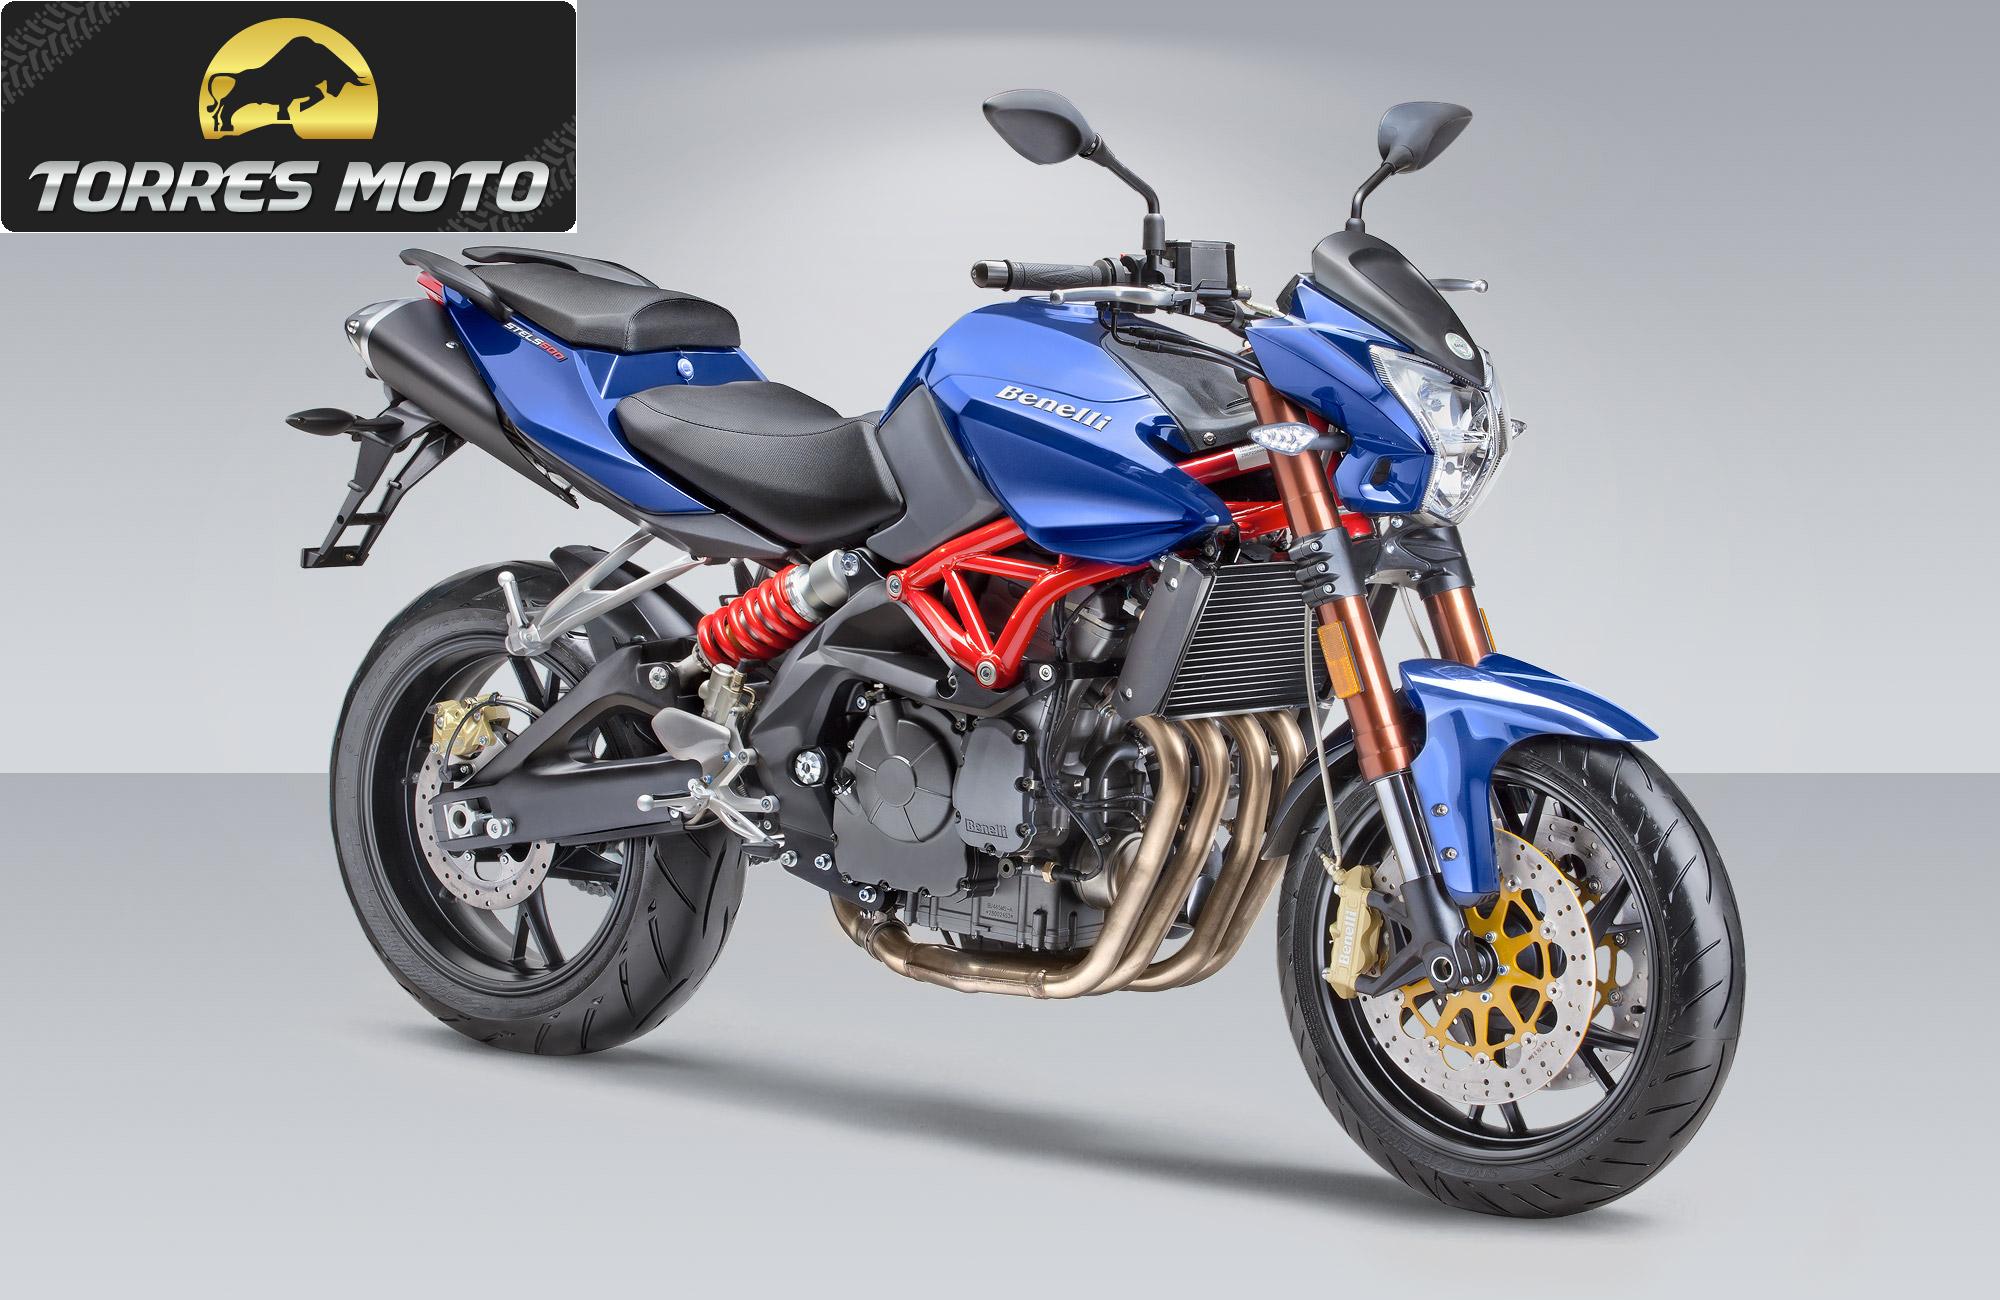 Продается мотоцикл STELS Benelli 600 2014 года